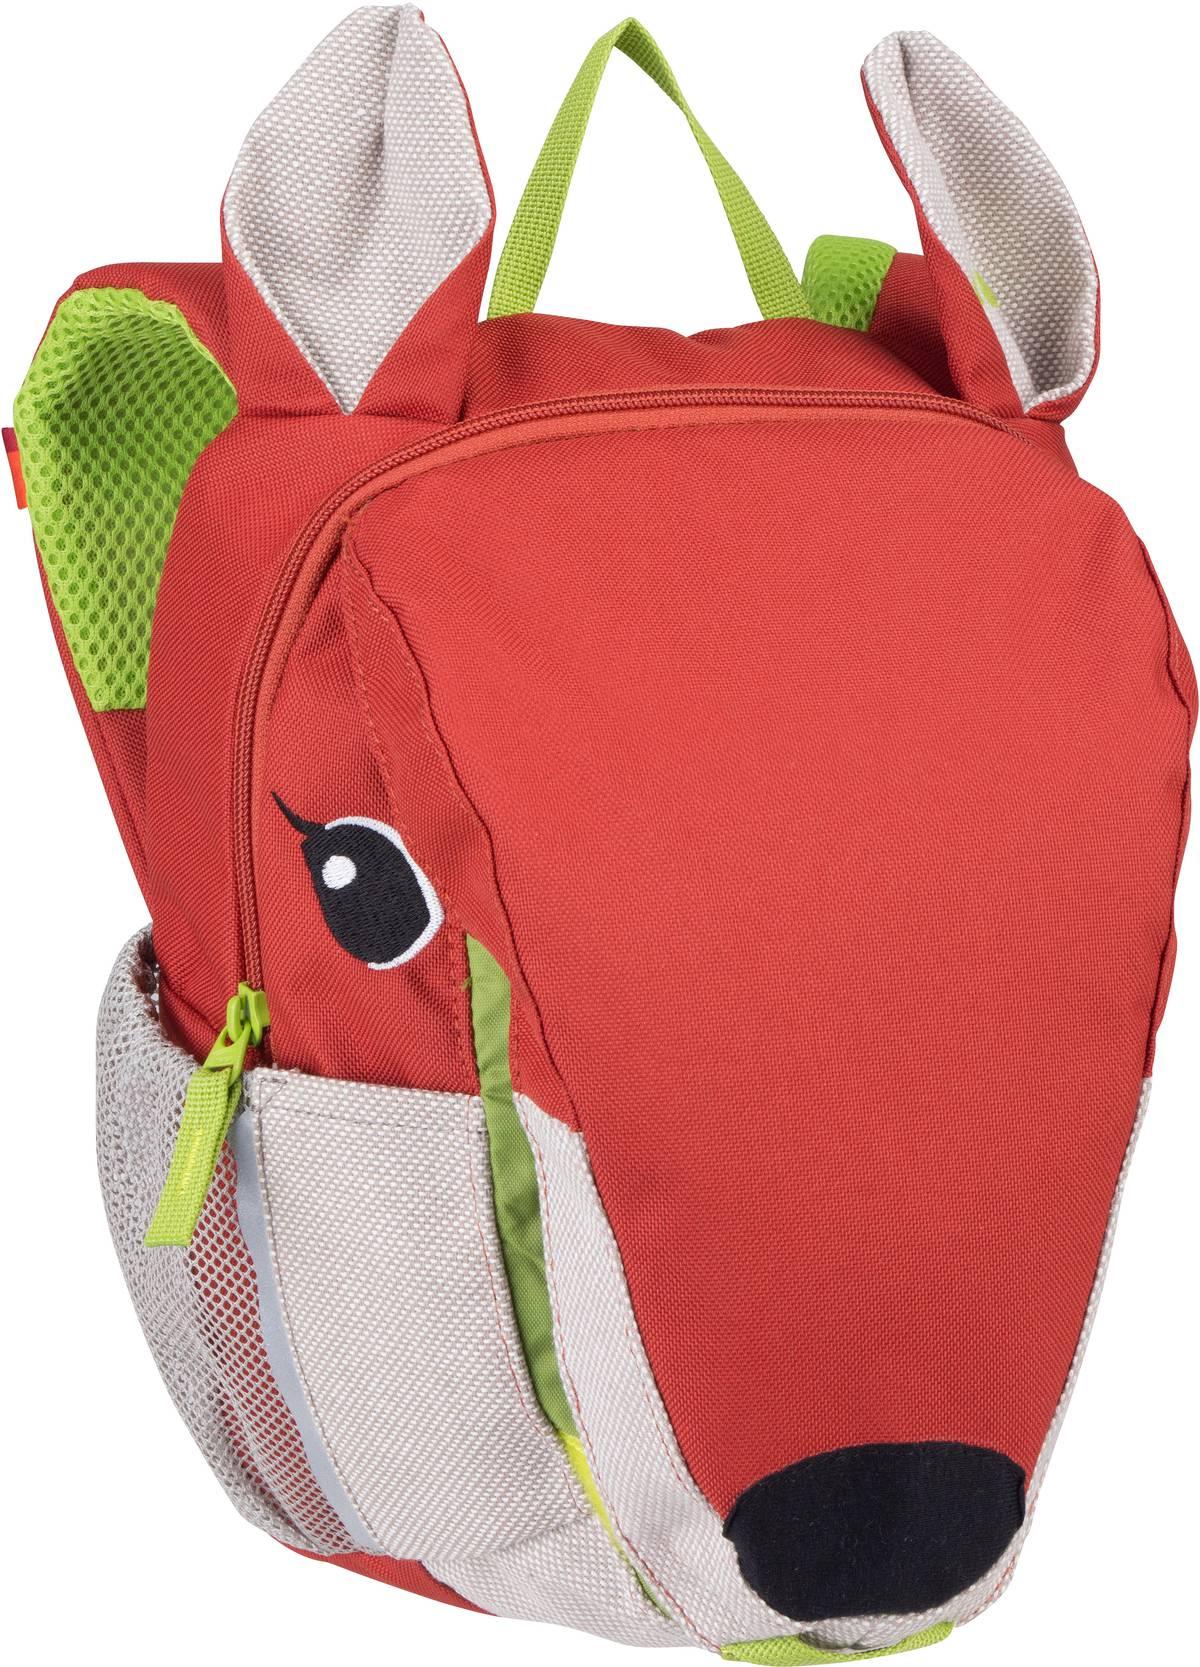 Rucksack / Daypack Easy-Peasy Backpack Wusel (6 Liter)